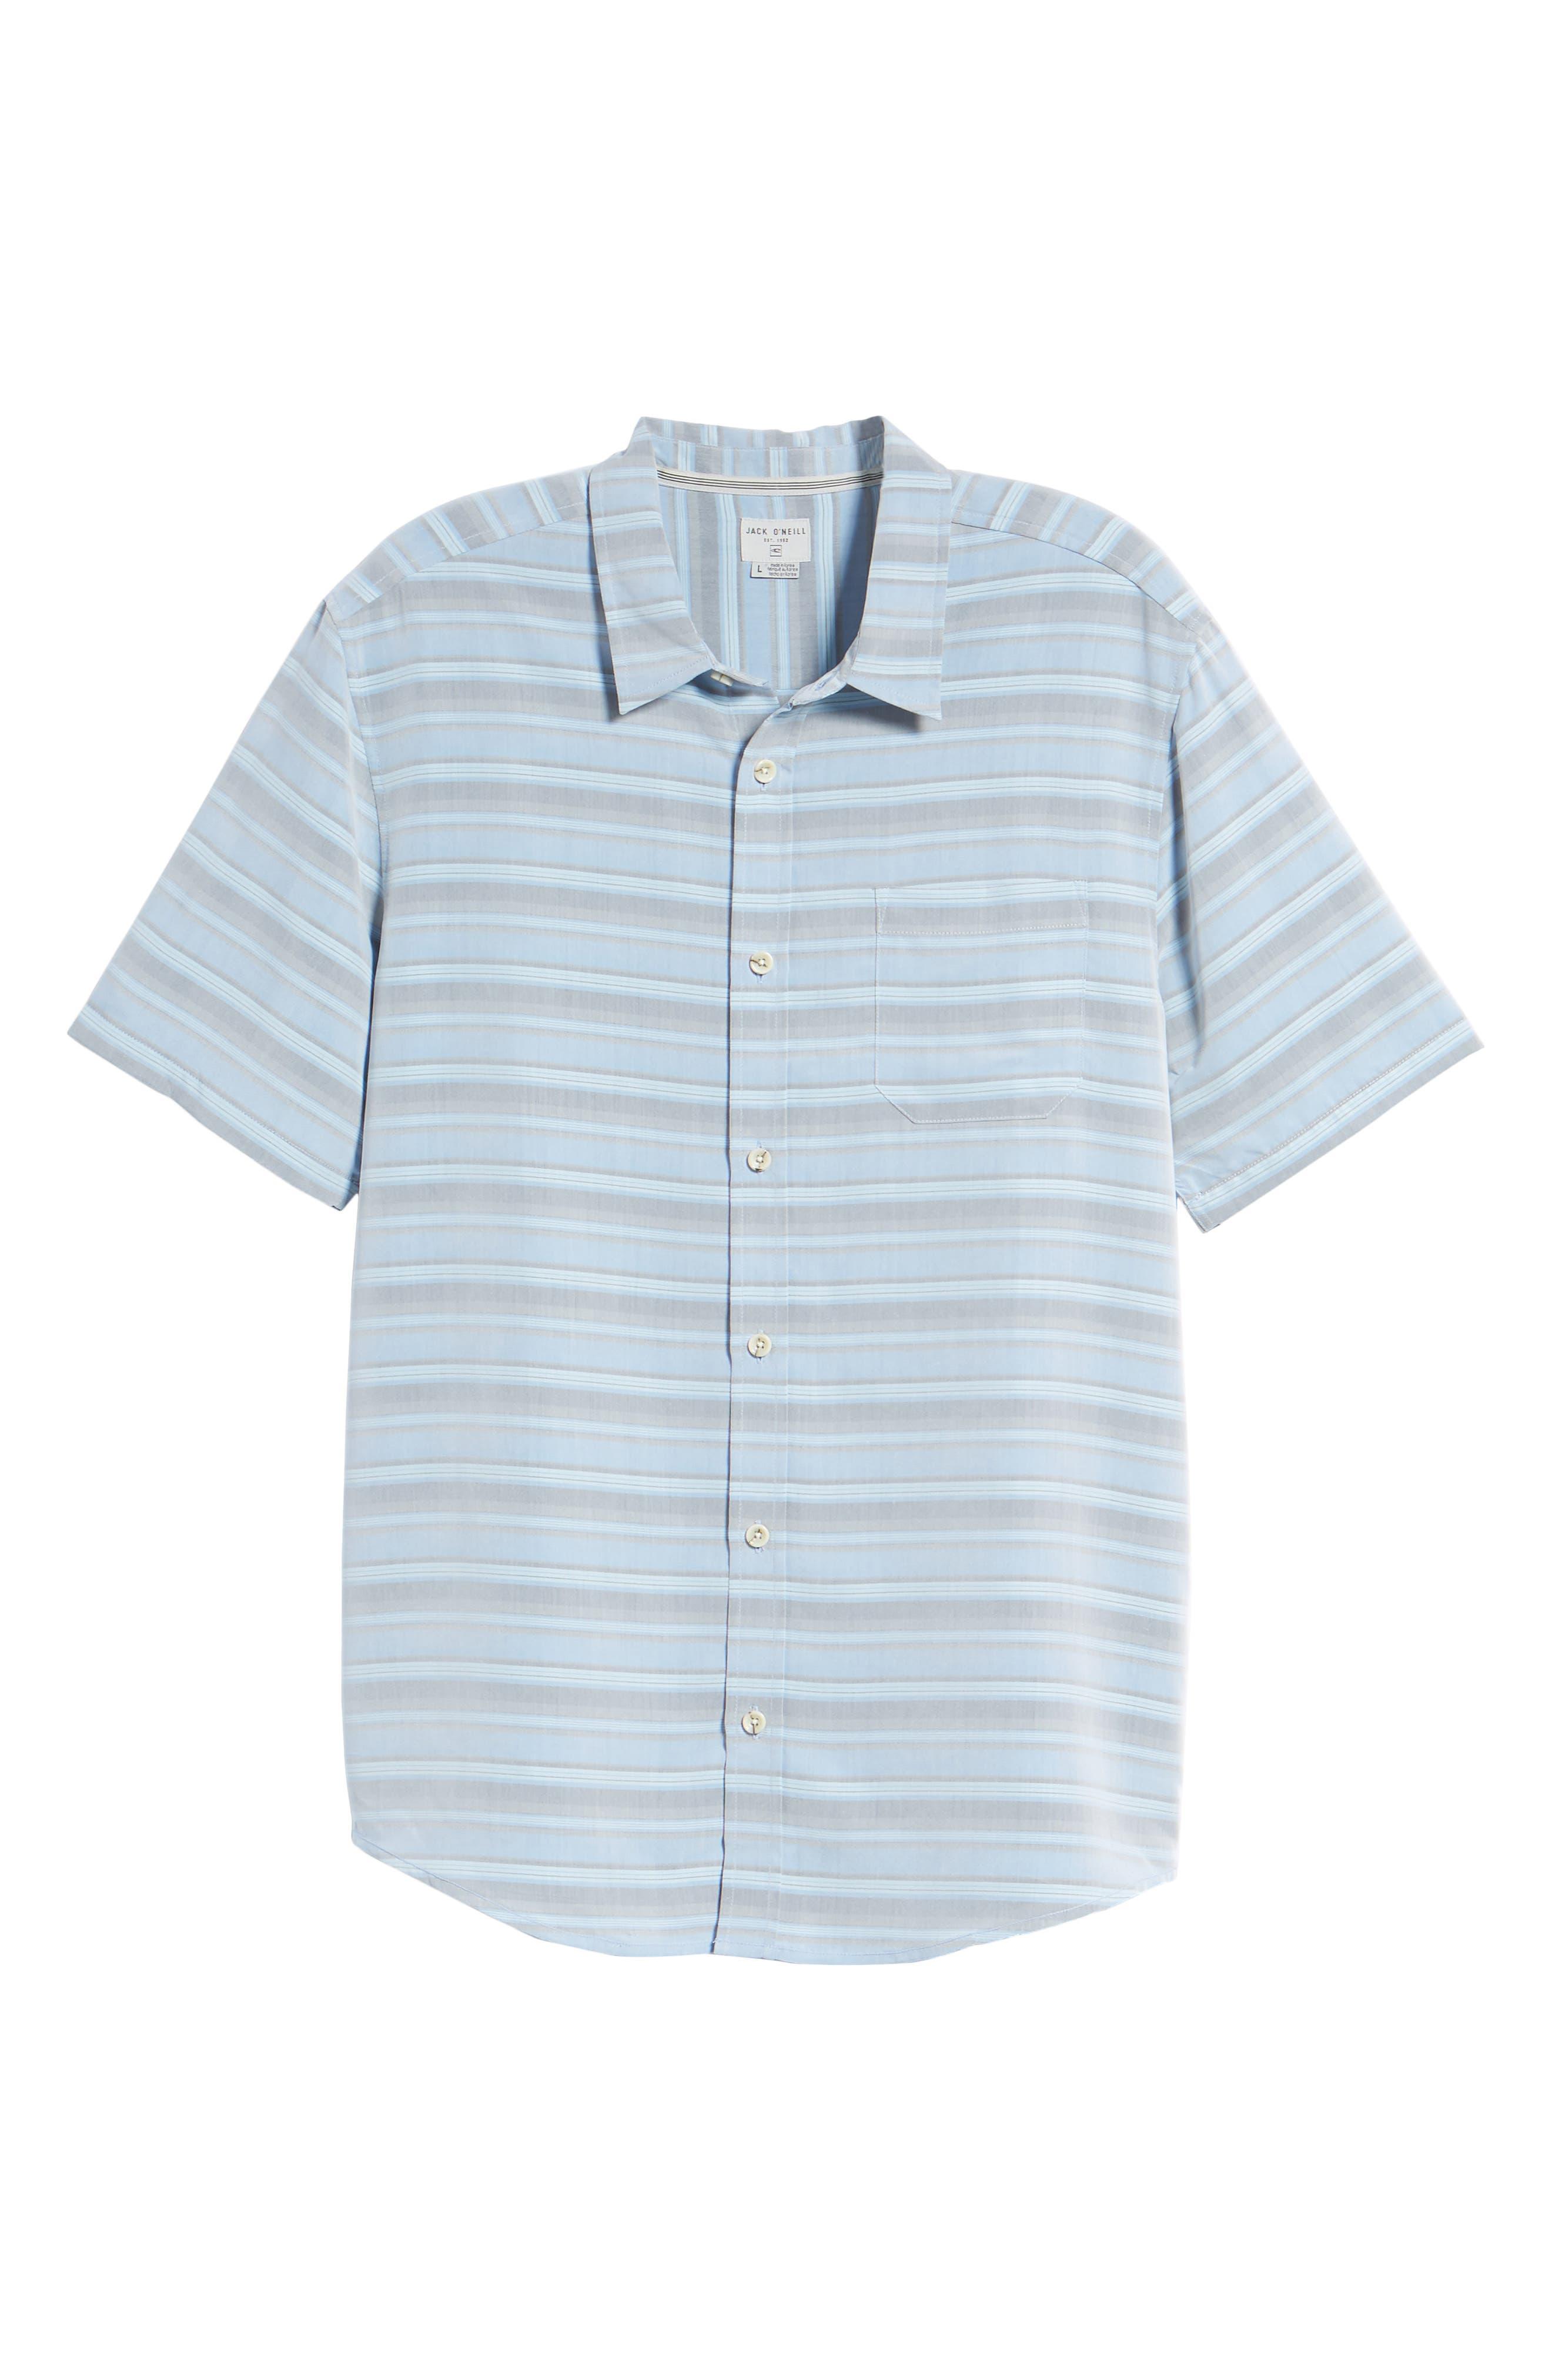 Tubes Regular Fit Short Sleeve Sport Shirt,                             Alternate thumbnail 6, color,                             COBALT